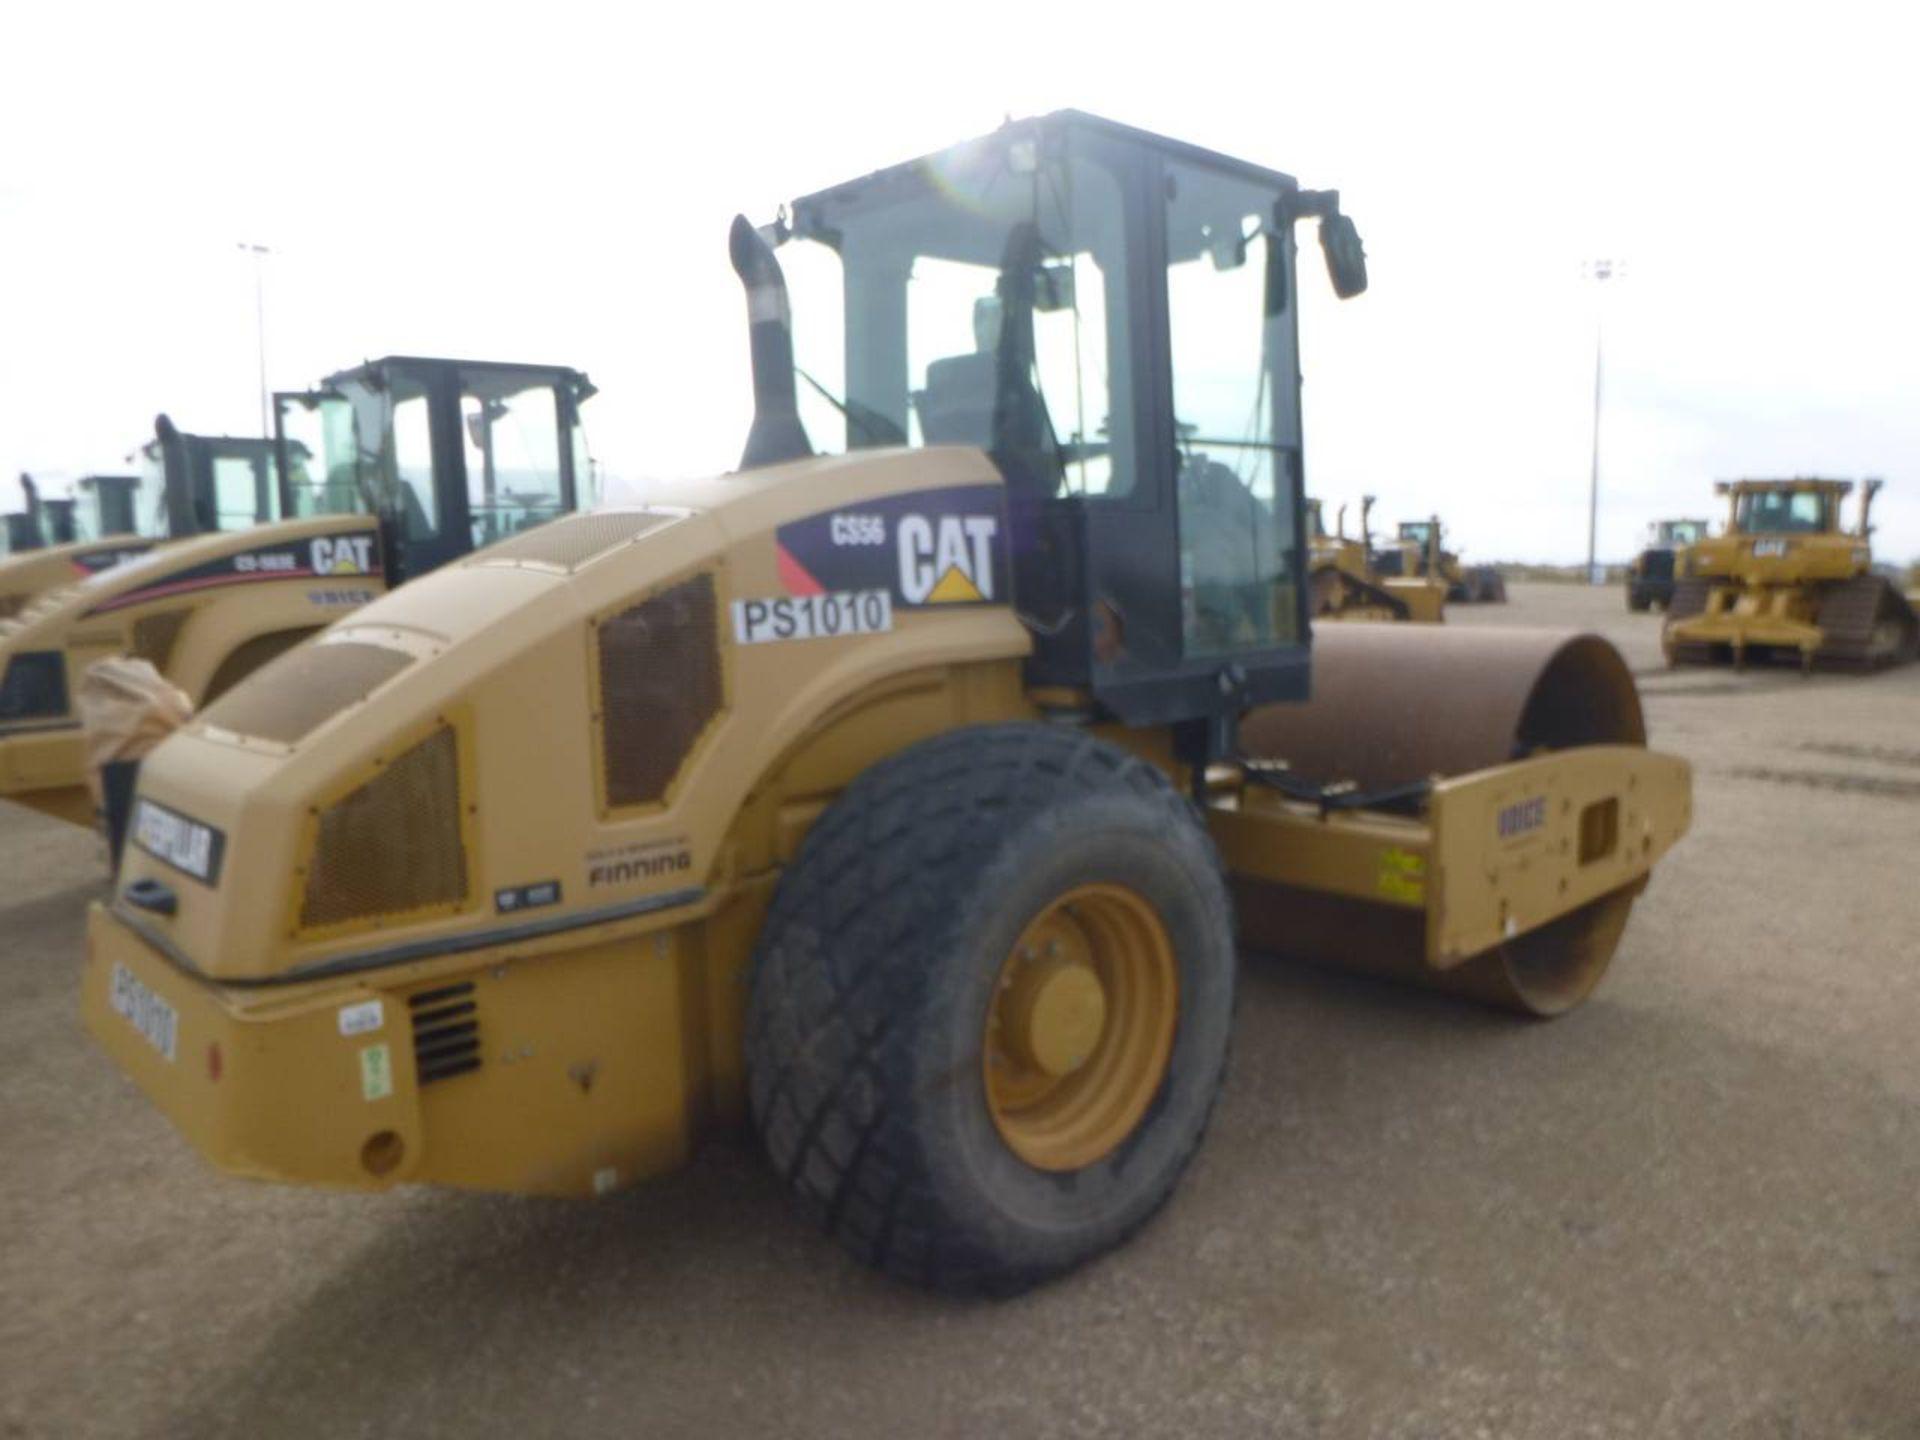 2011 Caterpillar CS56 Compactor - Image 3 of 9